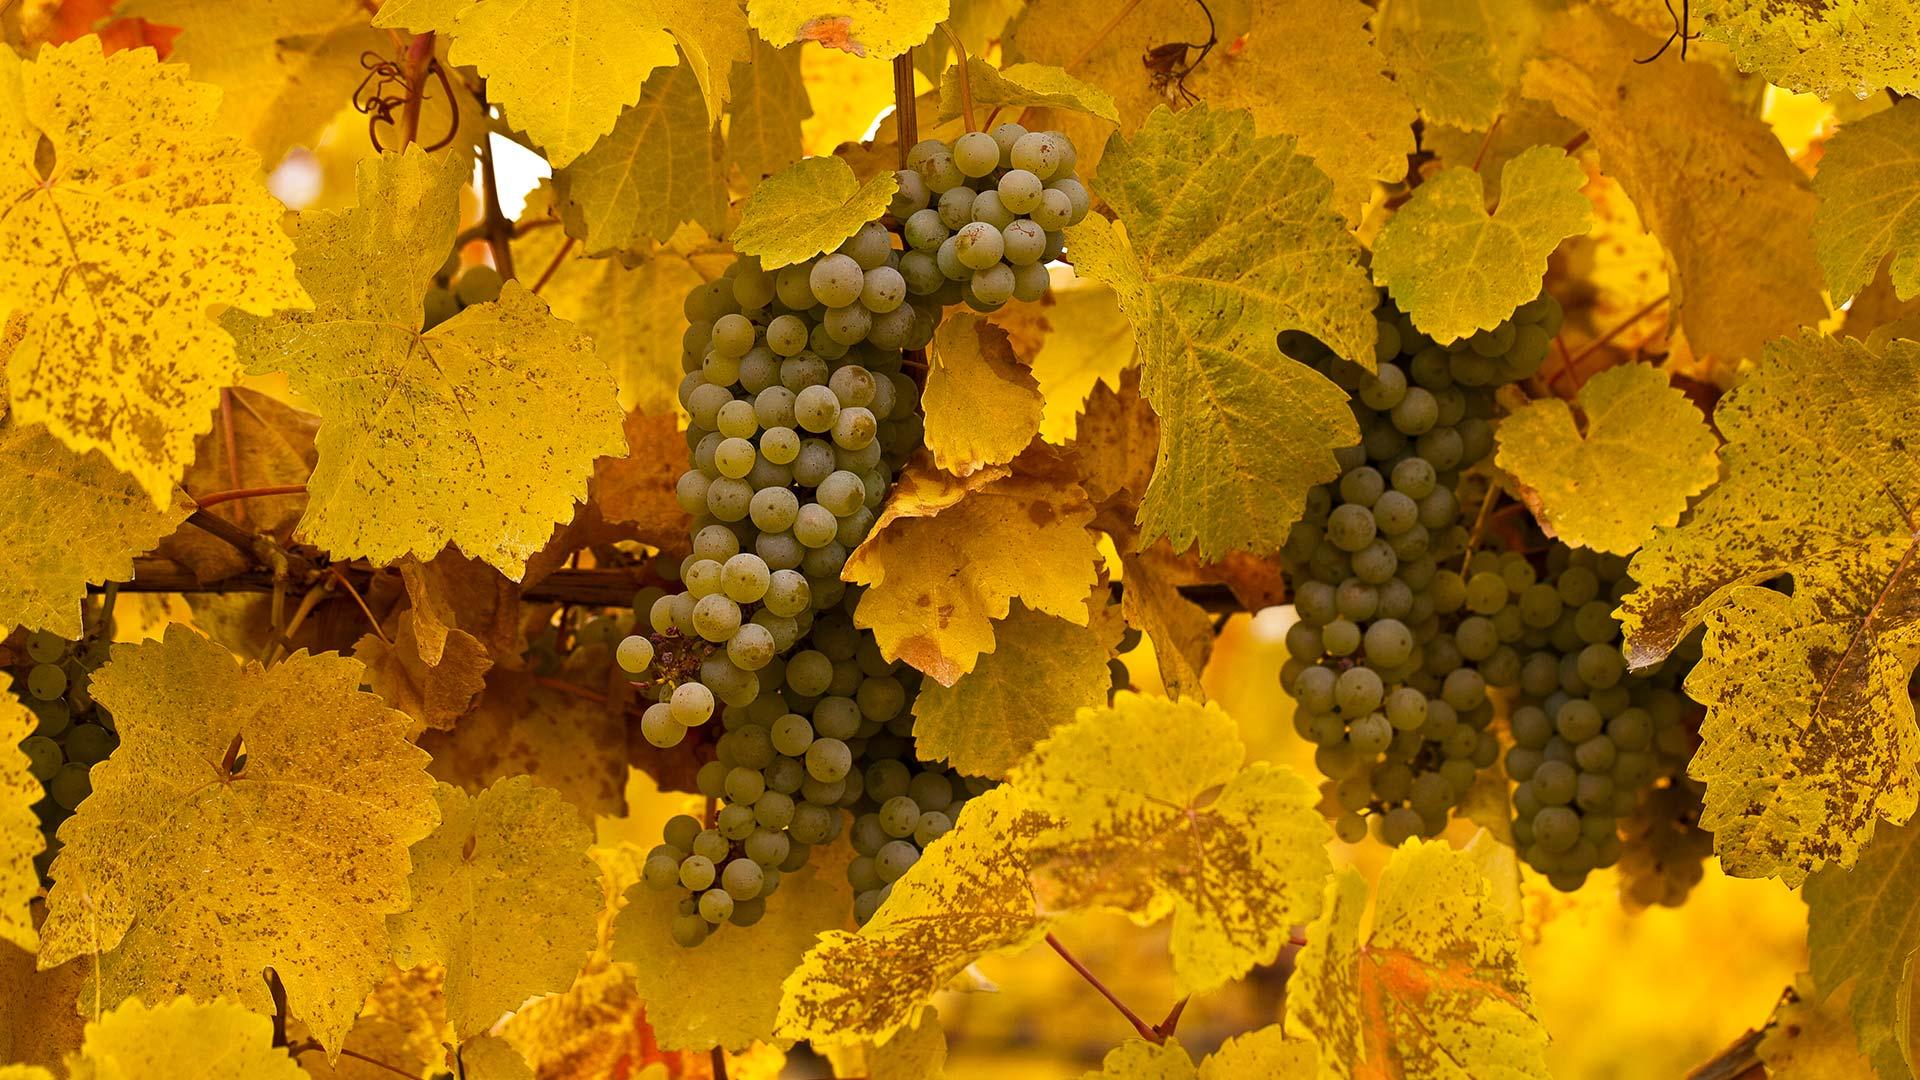 Gewürztraminer grapes at autumn harvest, Okanagan Valley, B.C., Canada (© Henry Georgi/age fotostock)